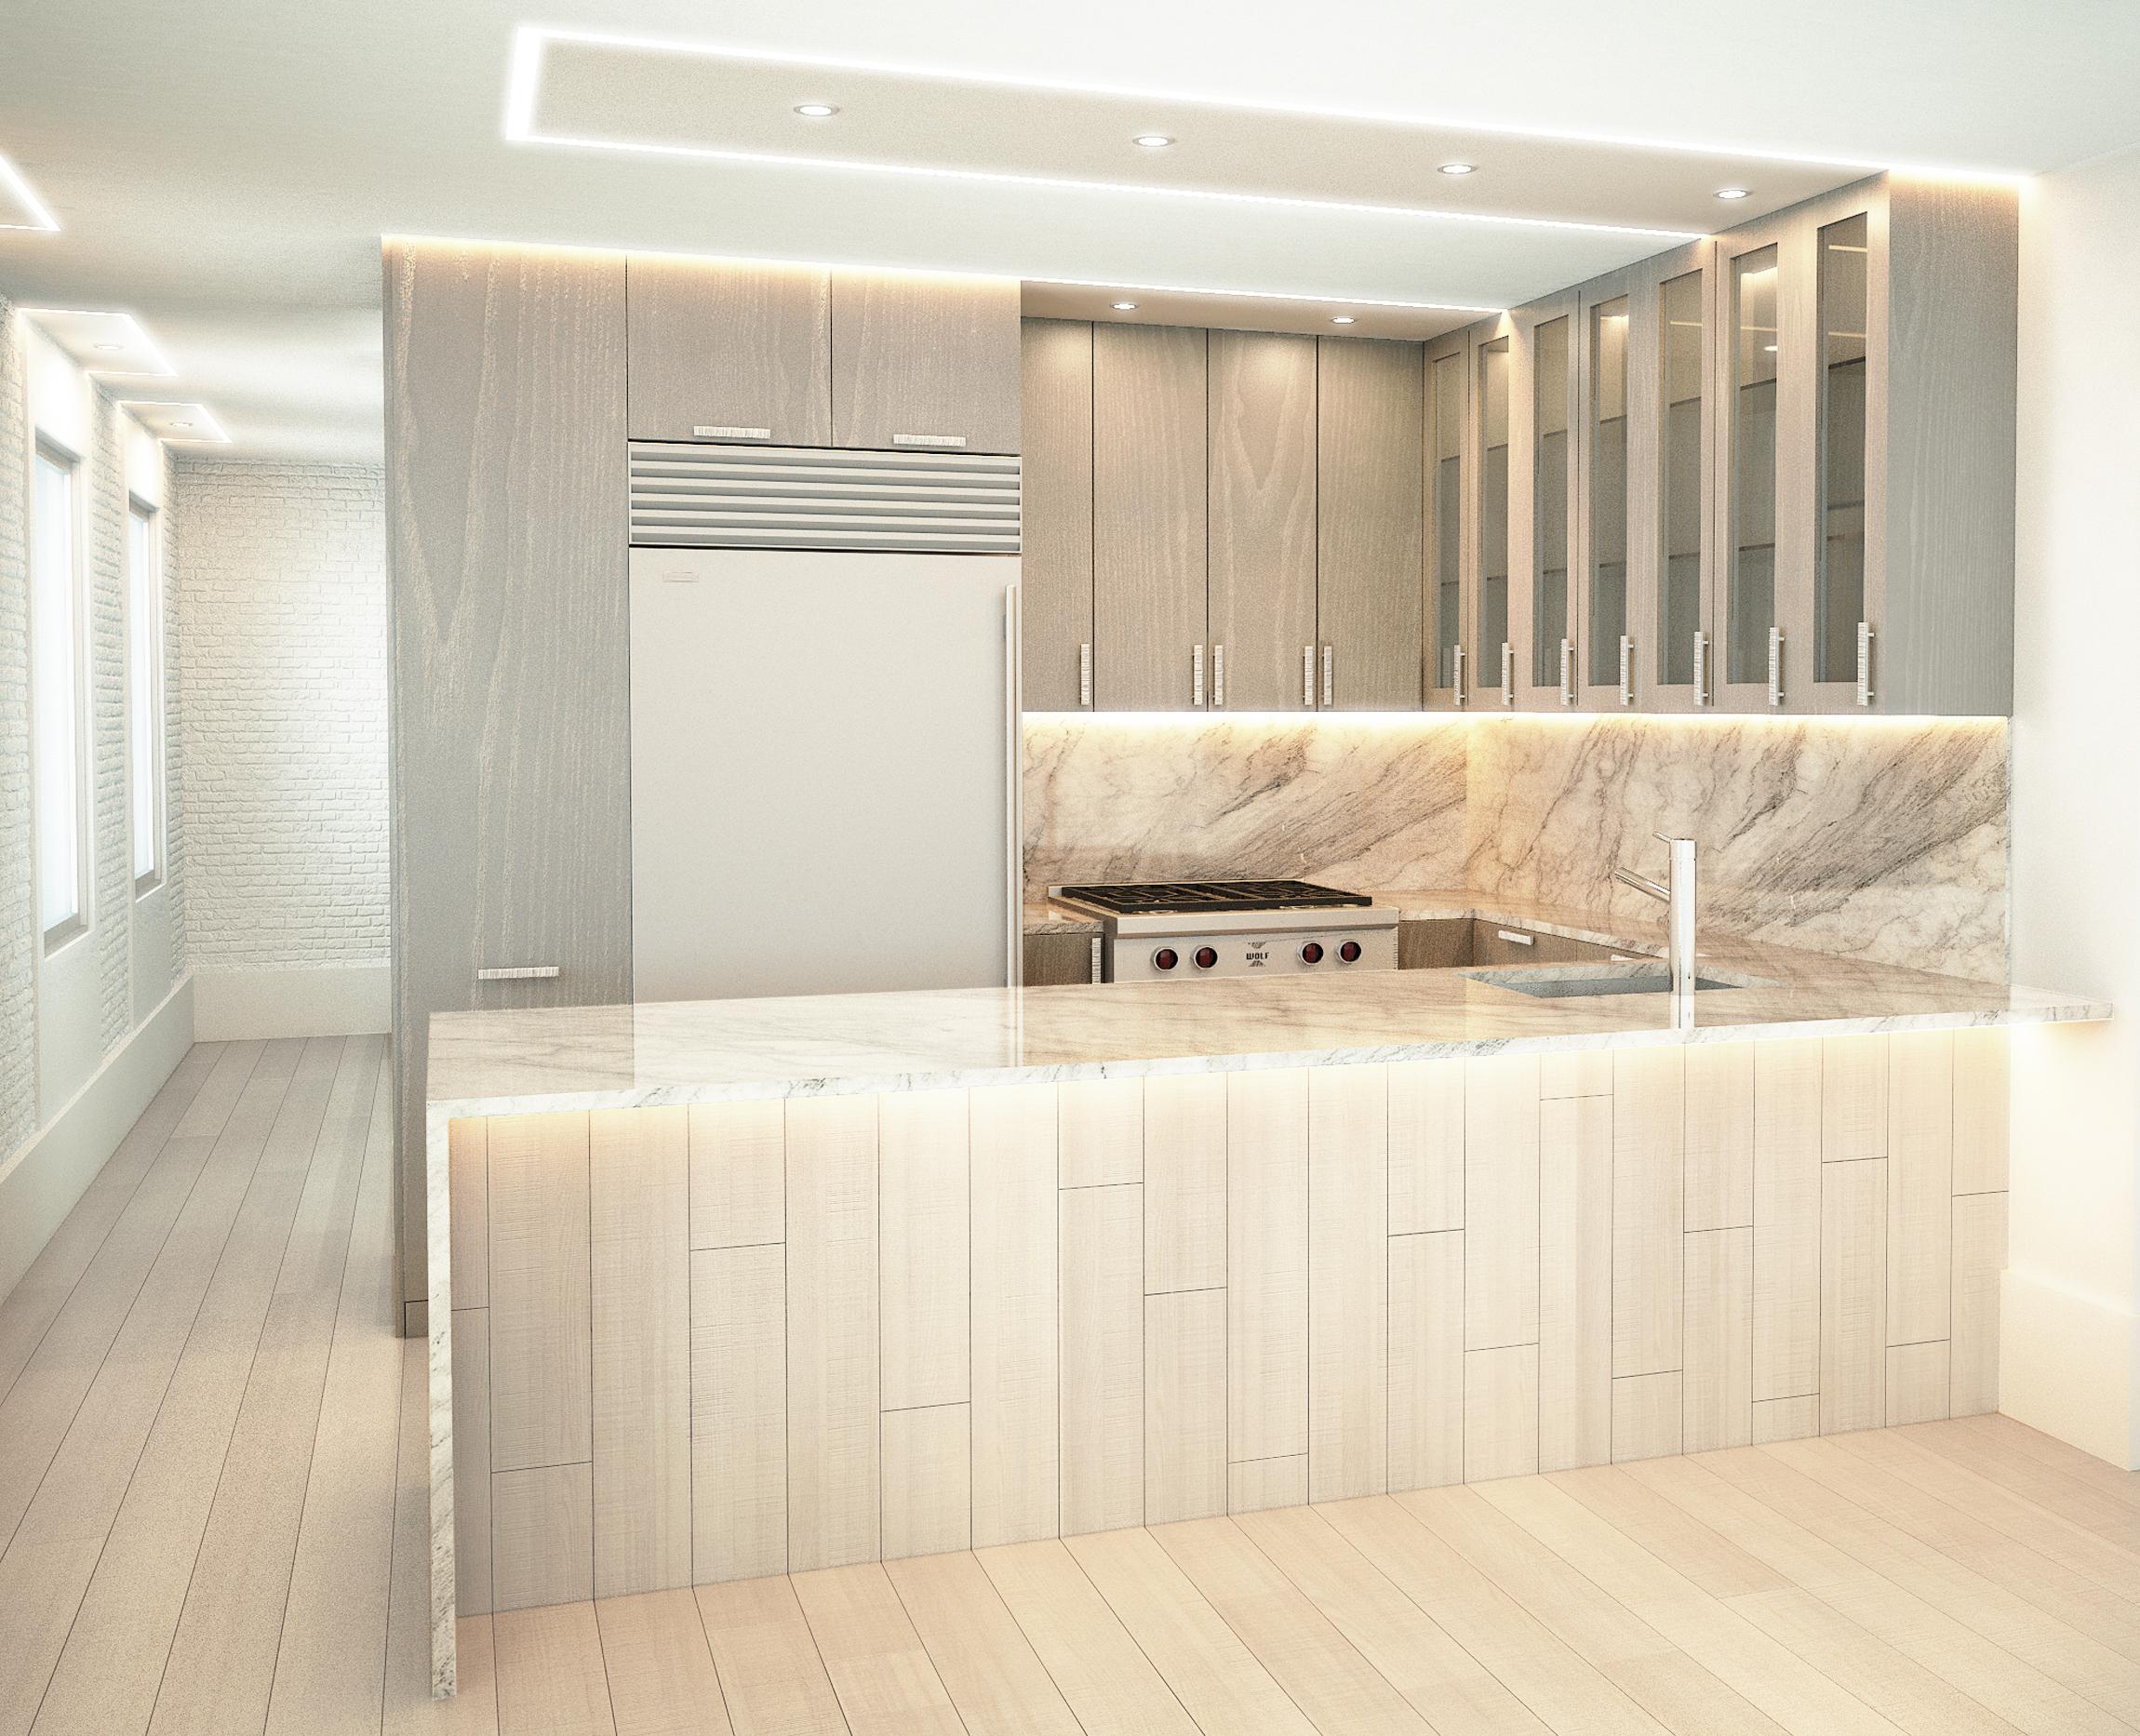 229Westbroadway_kitchen_scene2 (4).jpg